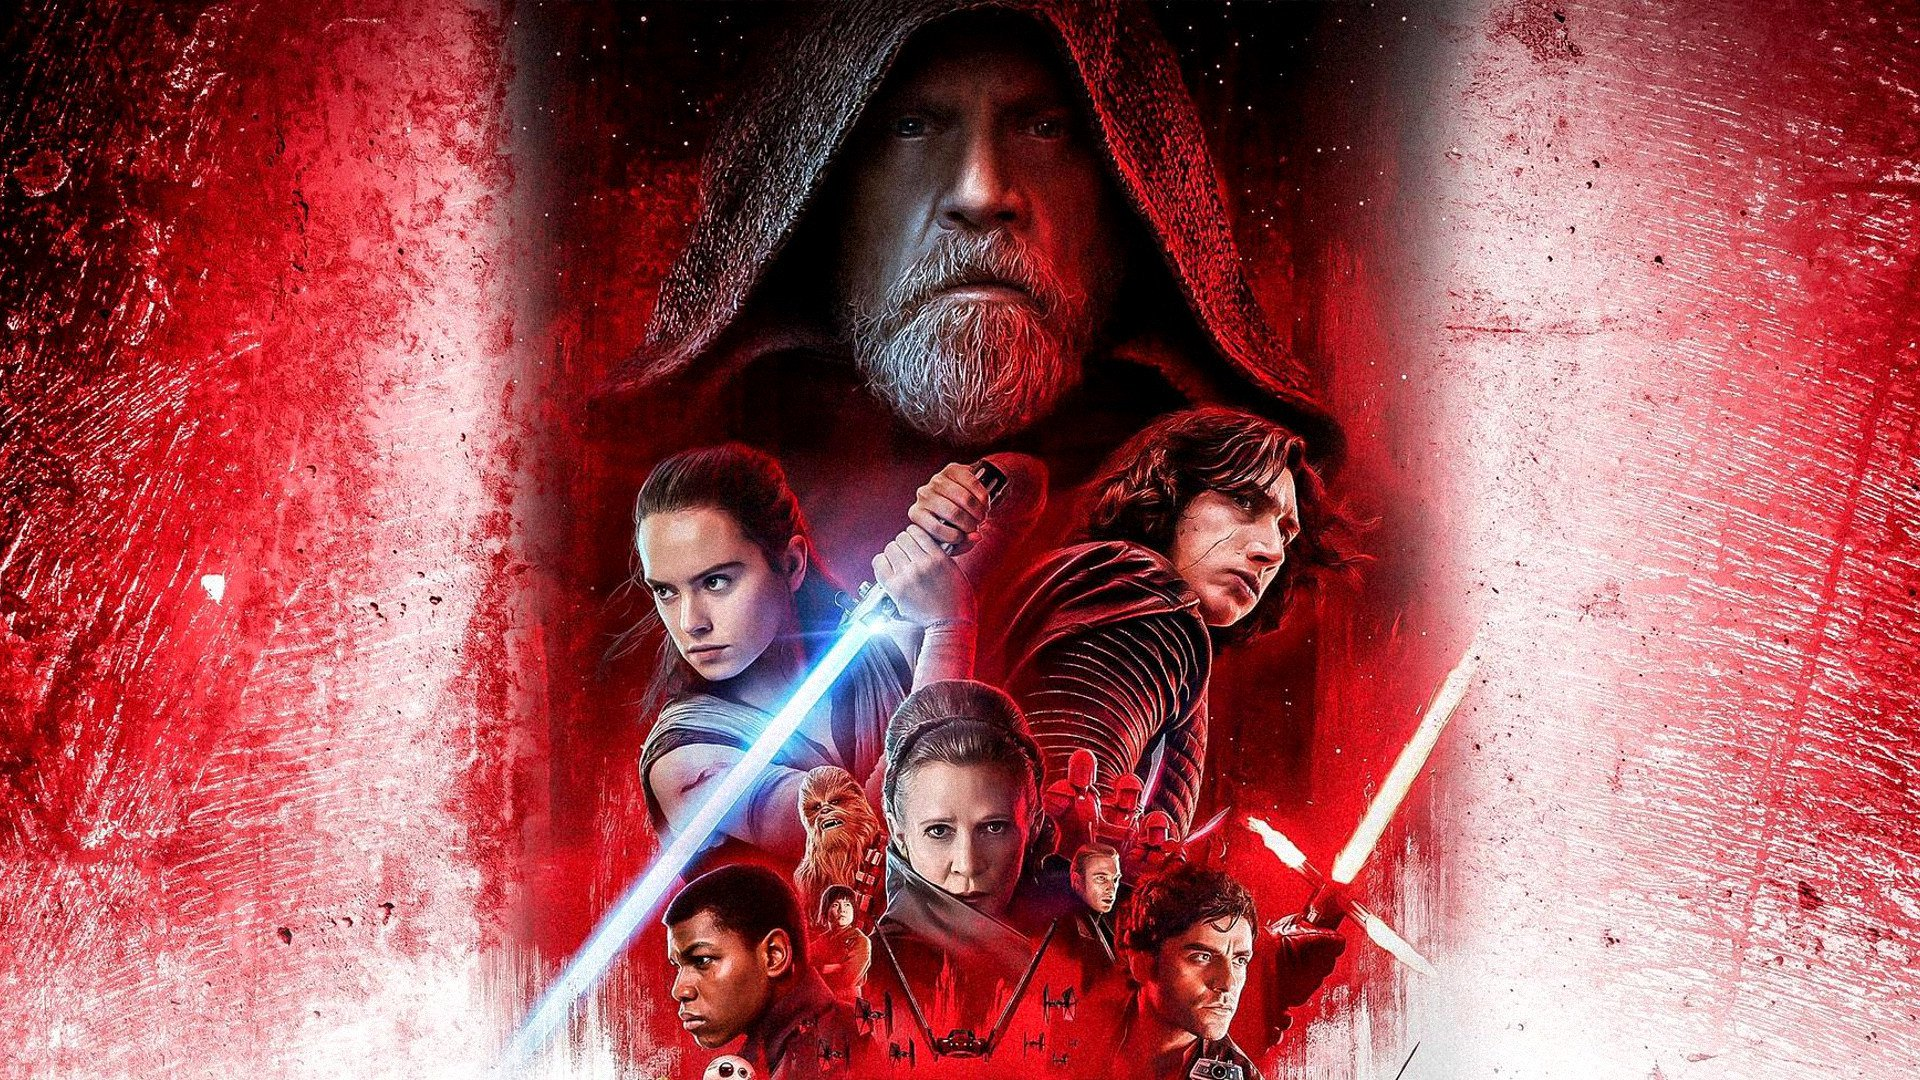 Star Wars The Last Jedi Hd Wallpaper Background Image